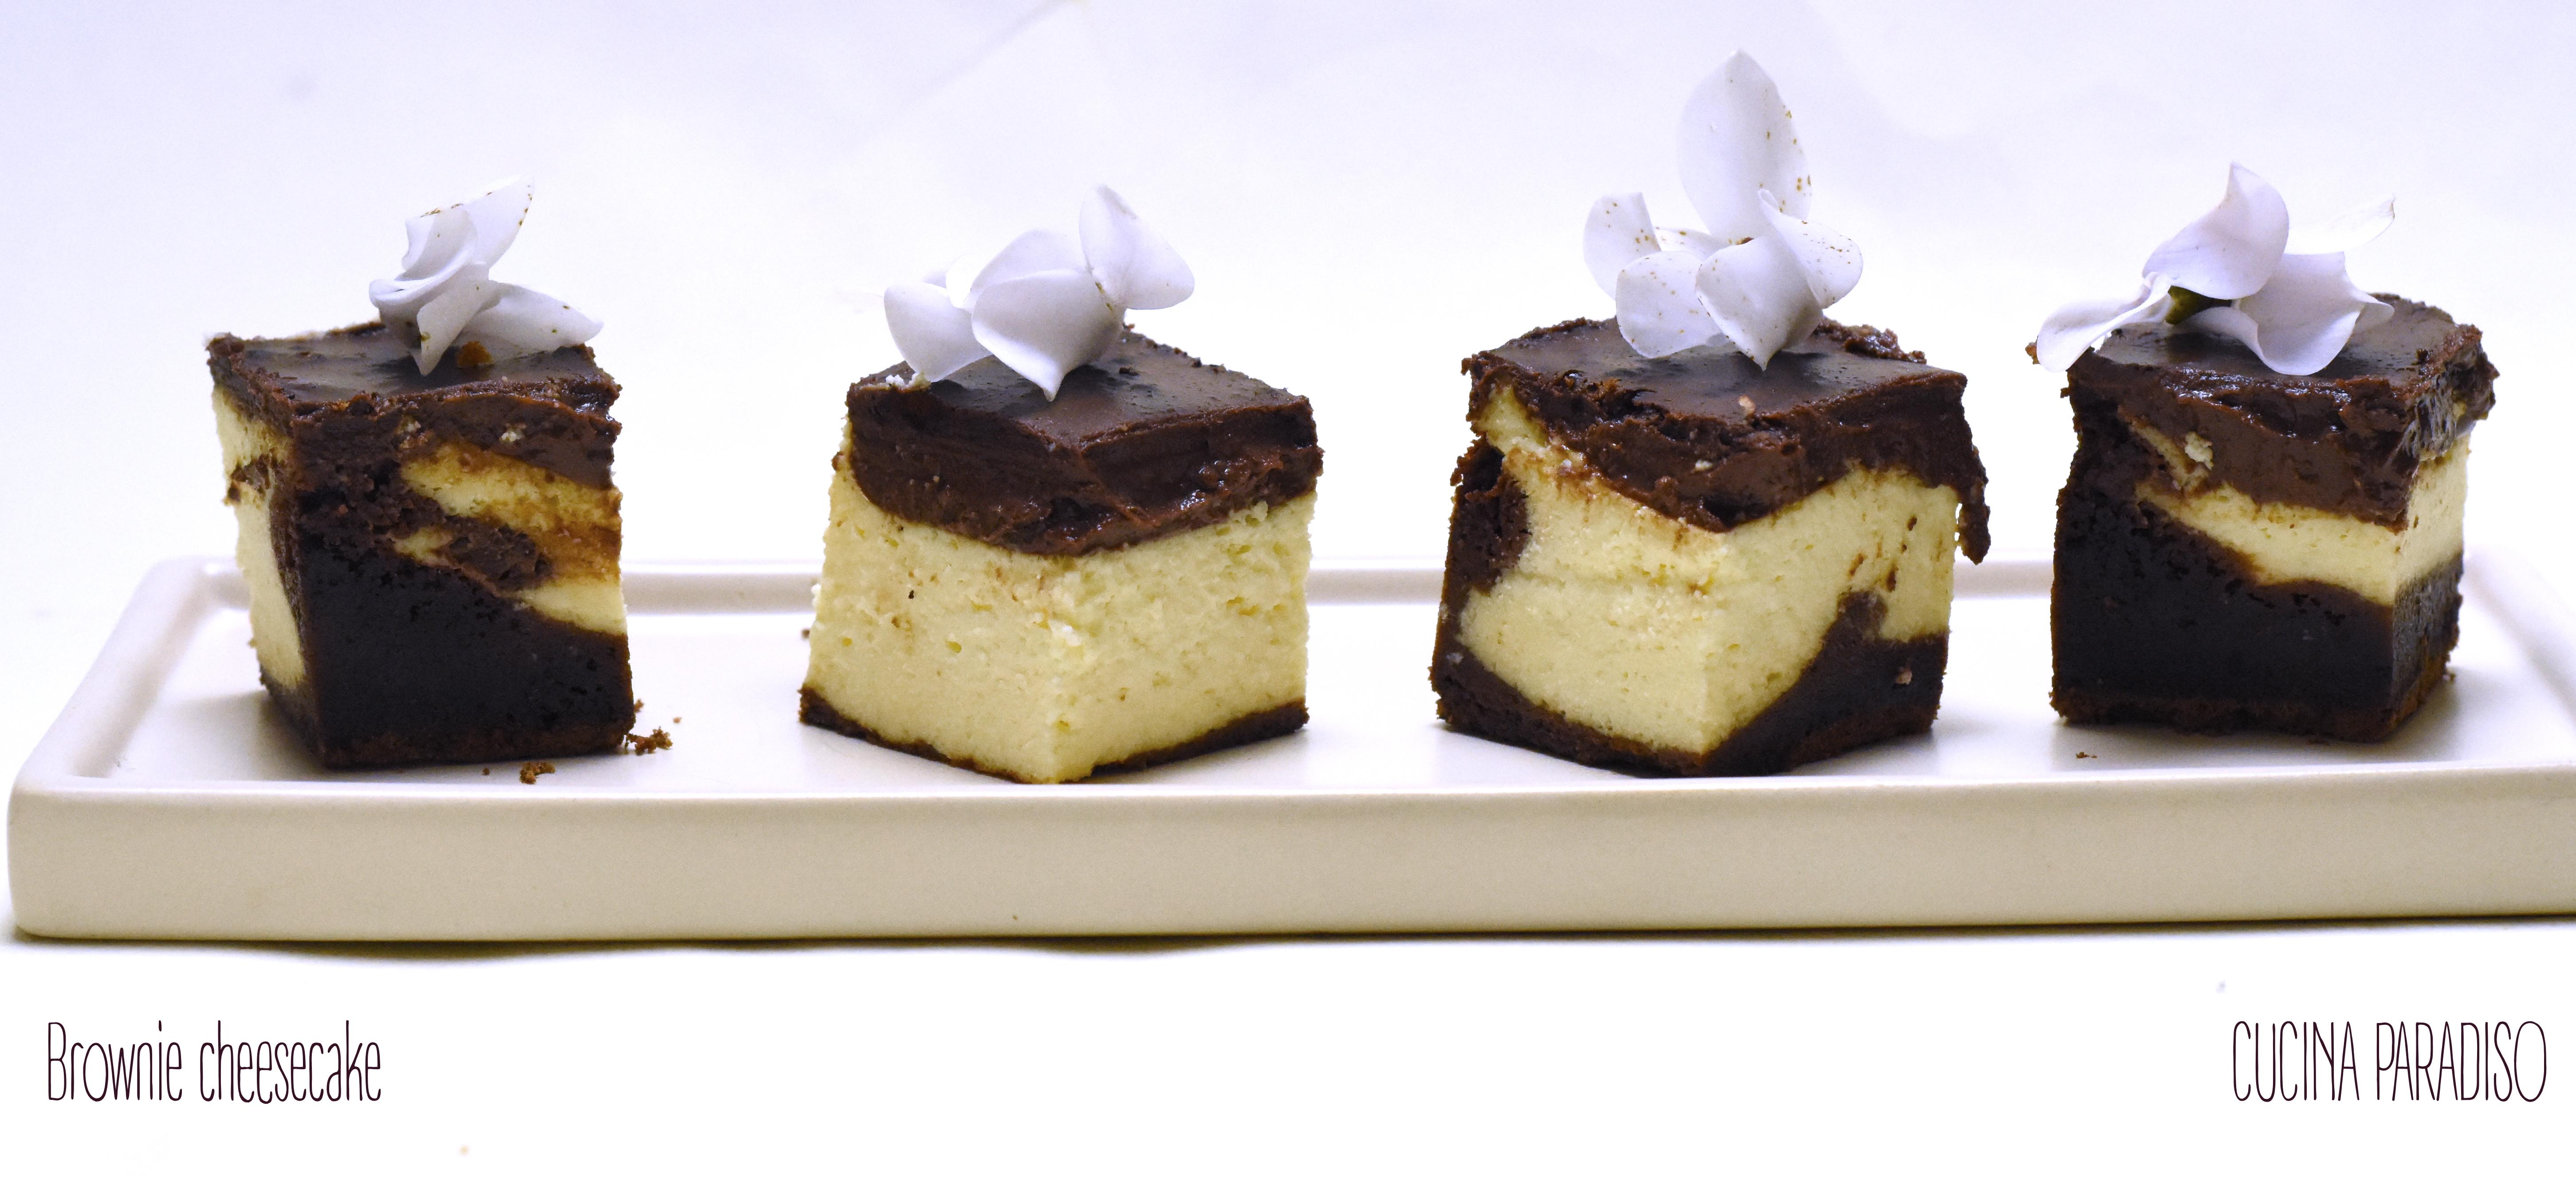 Brownie cheesecake 4